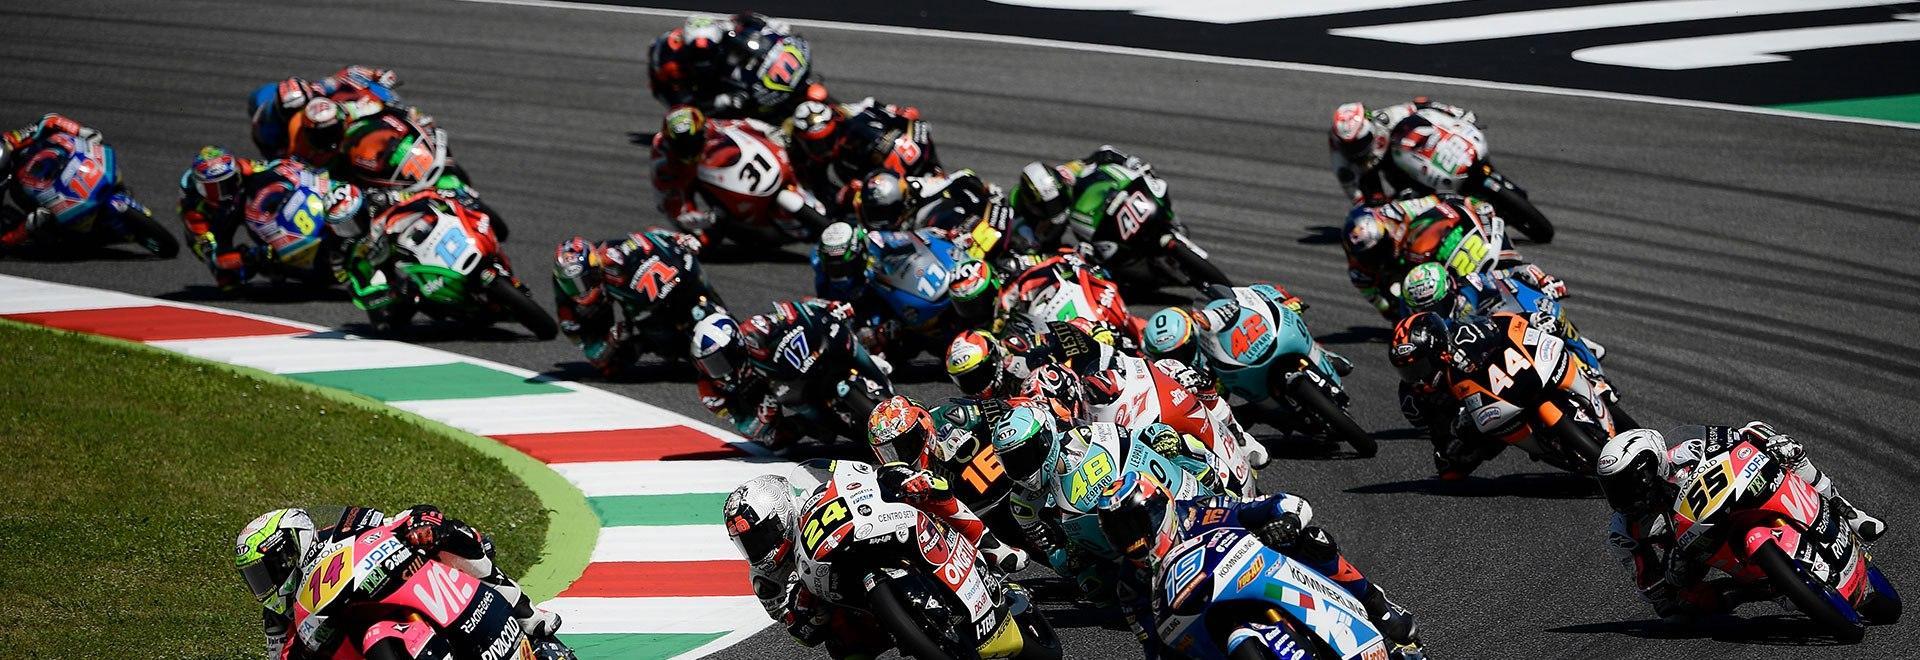 Moto3 Mugello. Race 2